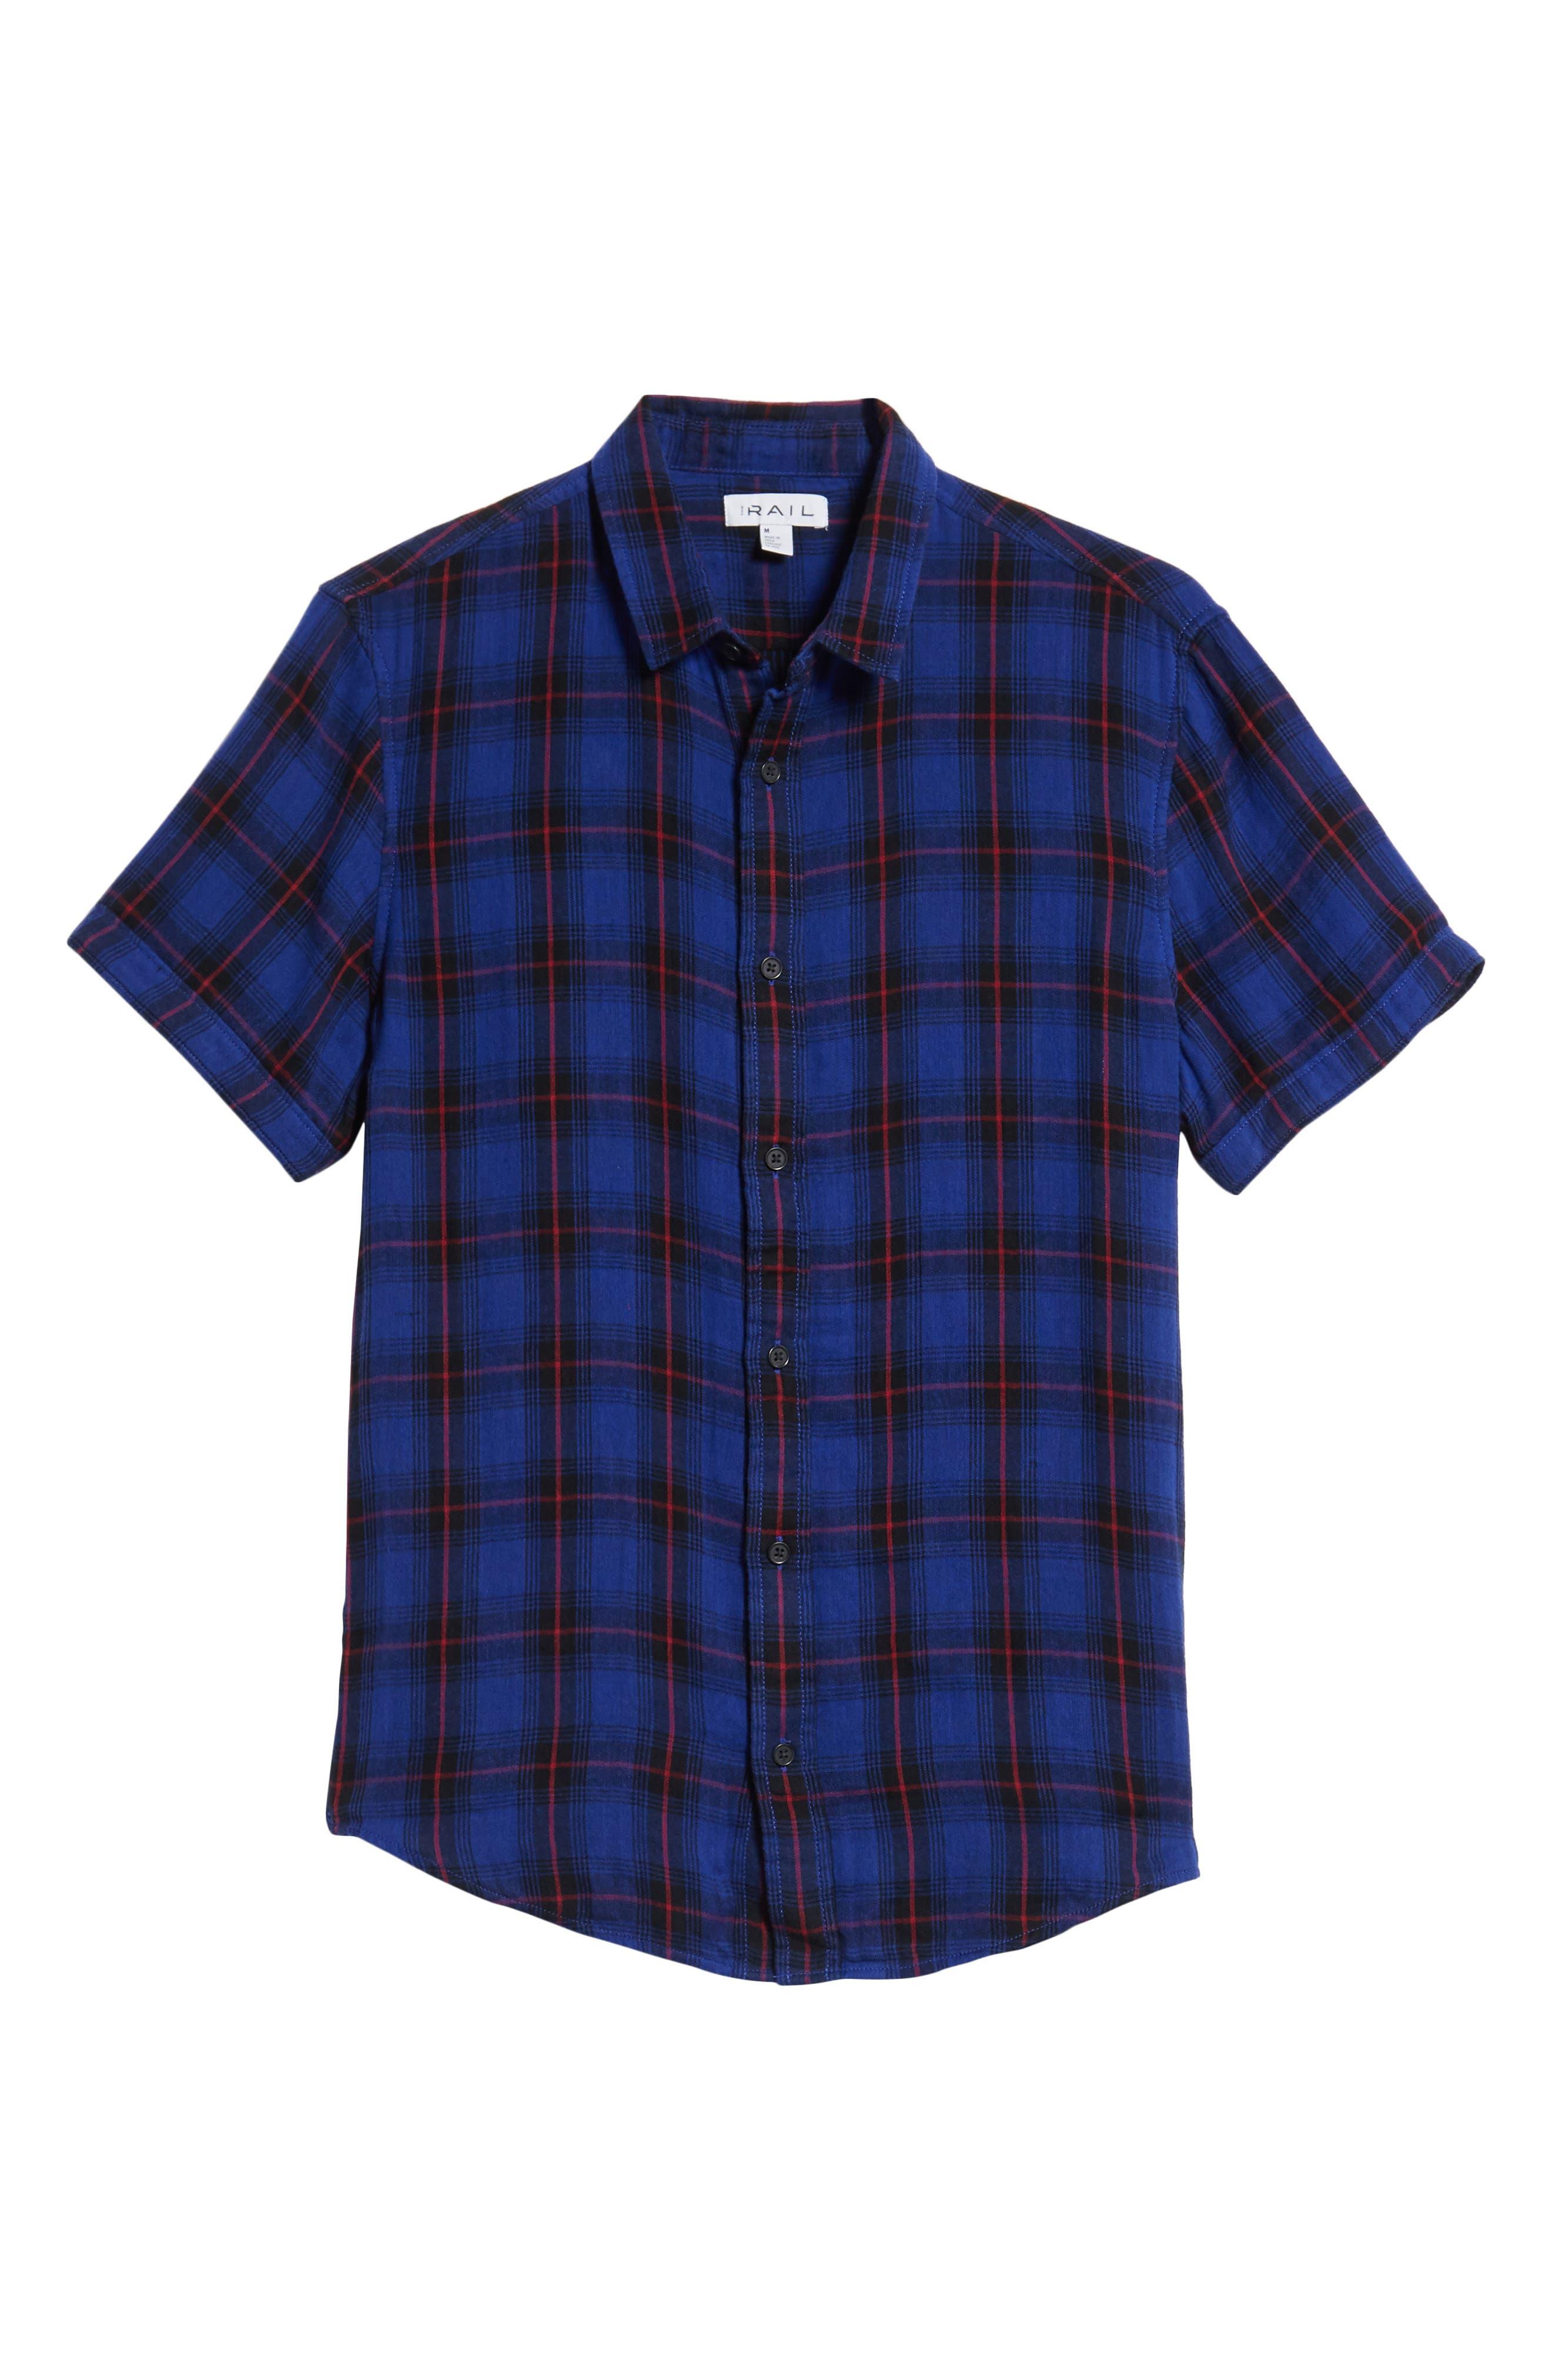 Plaid Woven Shirt,                             Alternate thumbnail 6, color,                             BLUE BLACK LUCA PLAID